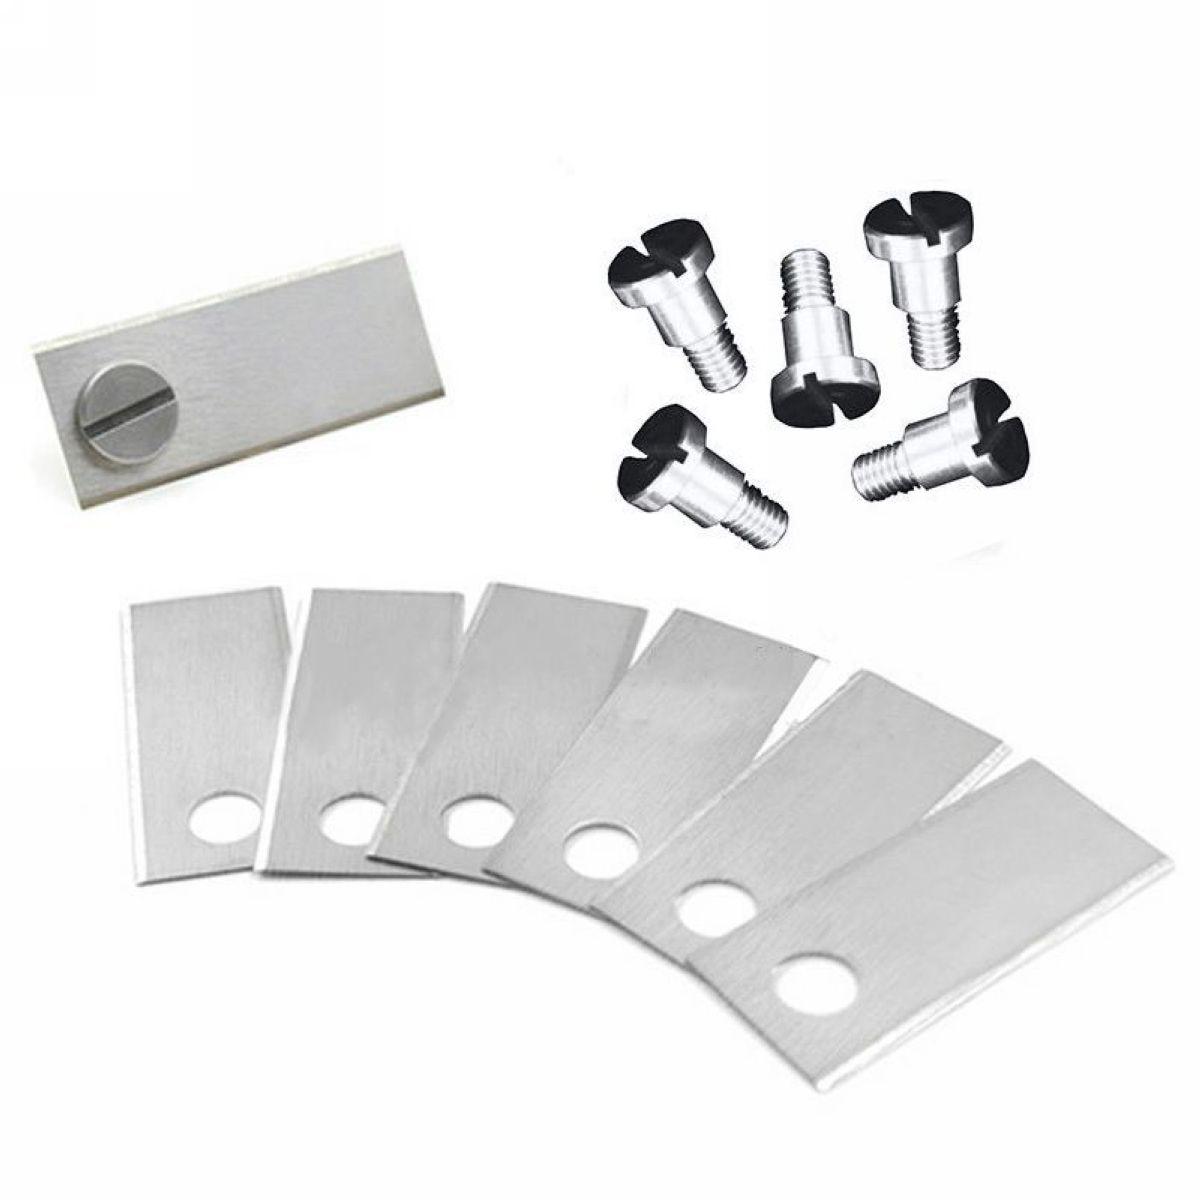 36PCS/set Auto Robot Mower Blade Lawnmower Blades & Screws 42*17.5*o.6mm Silver Tool accessories